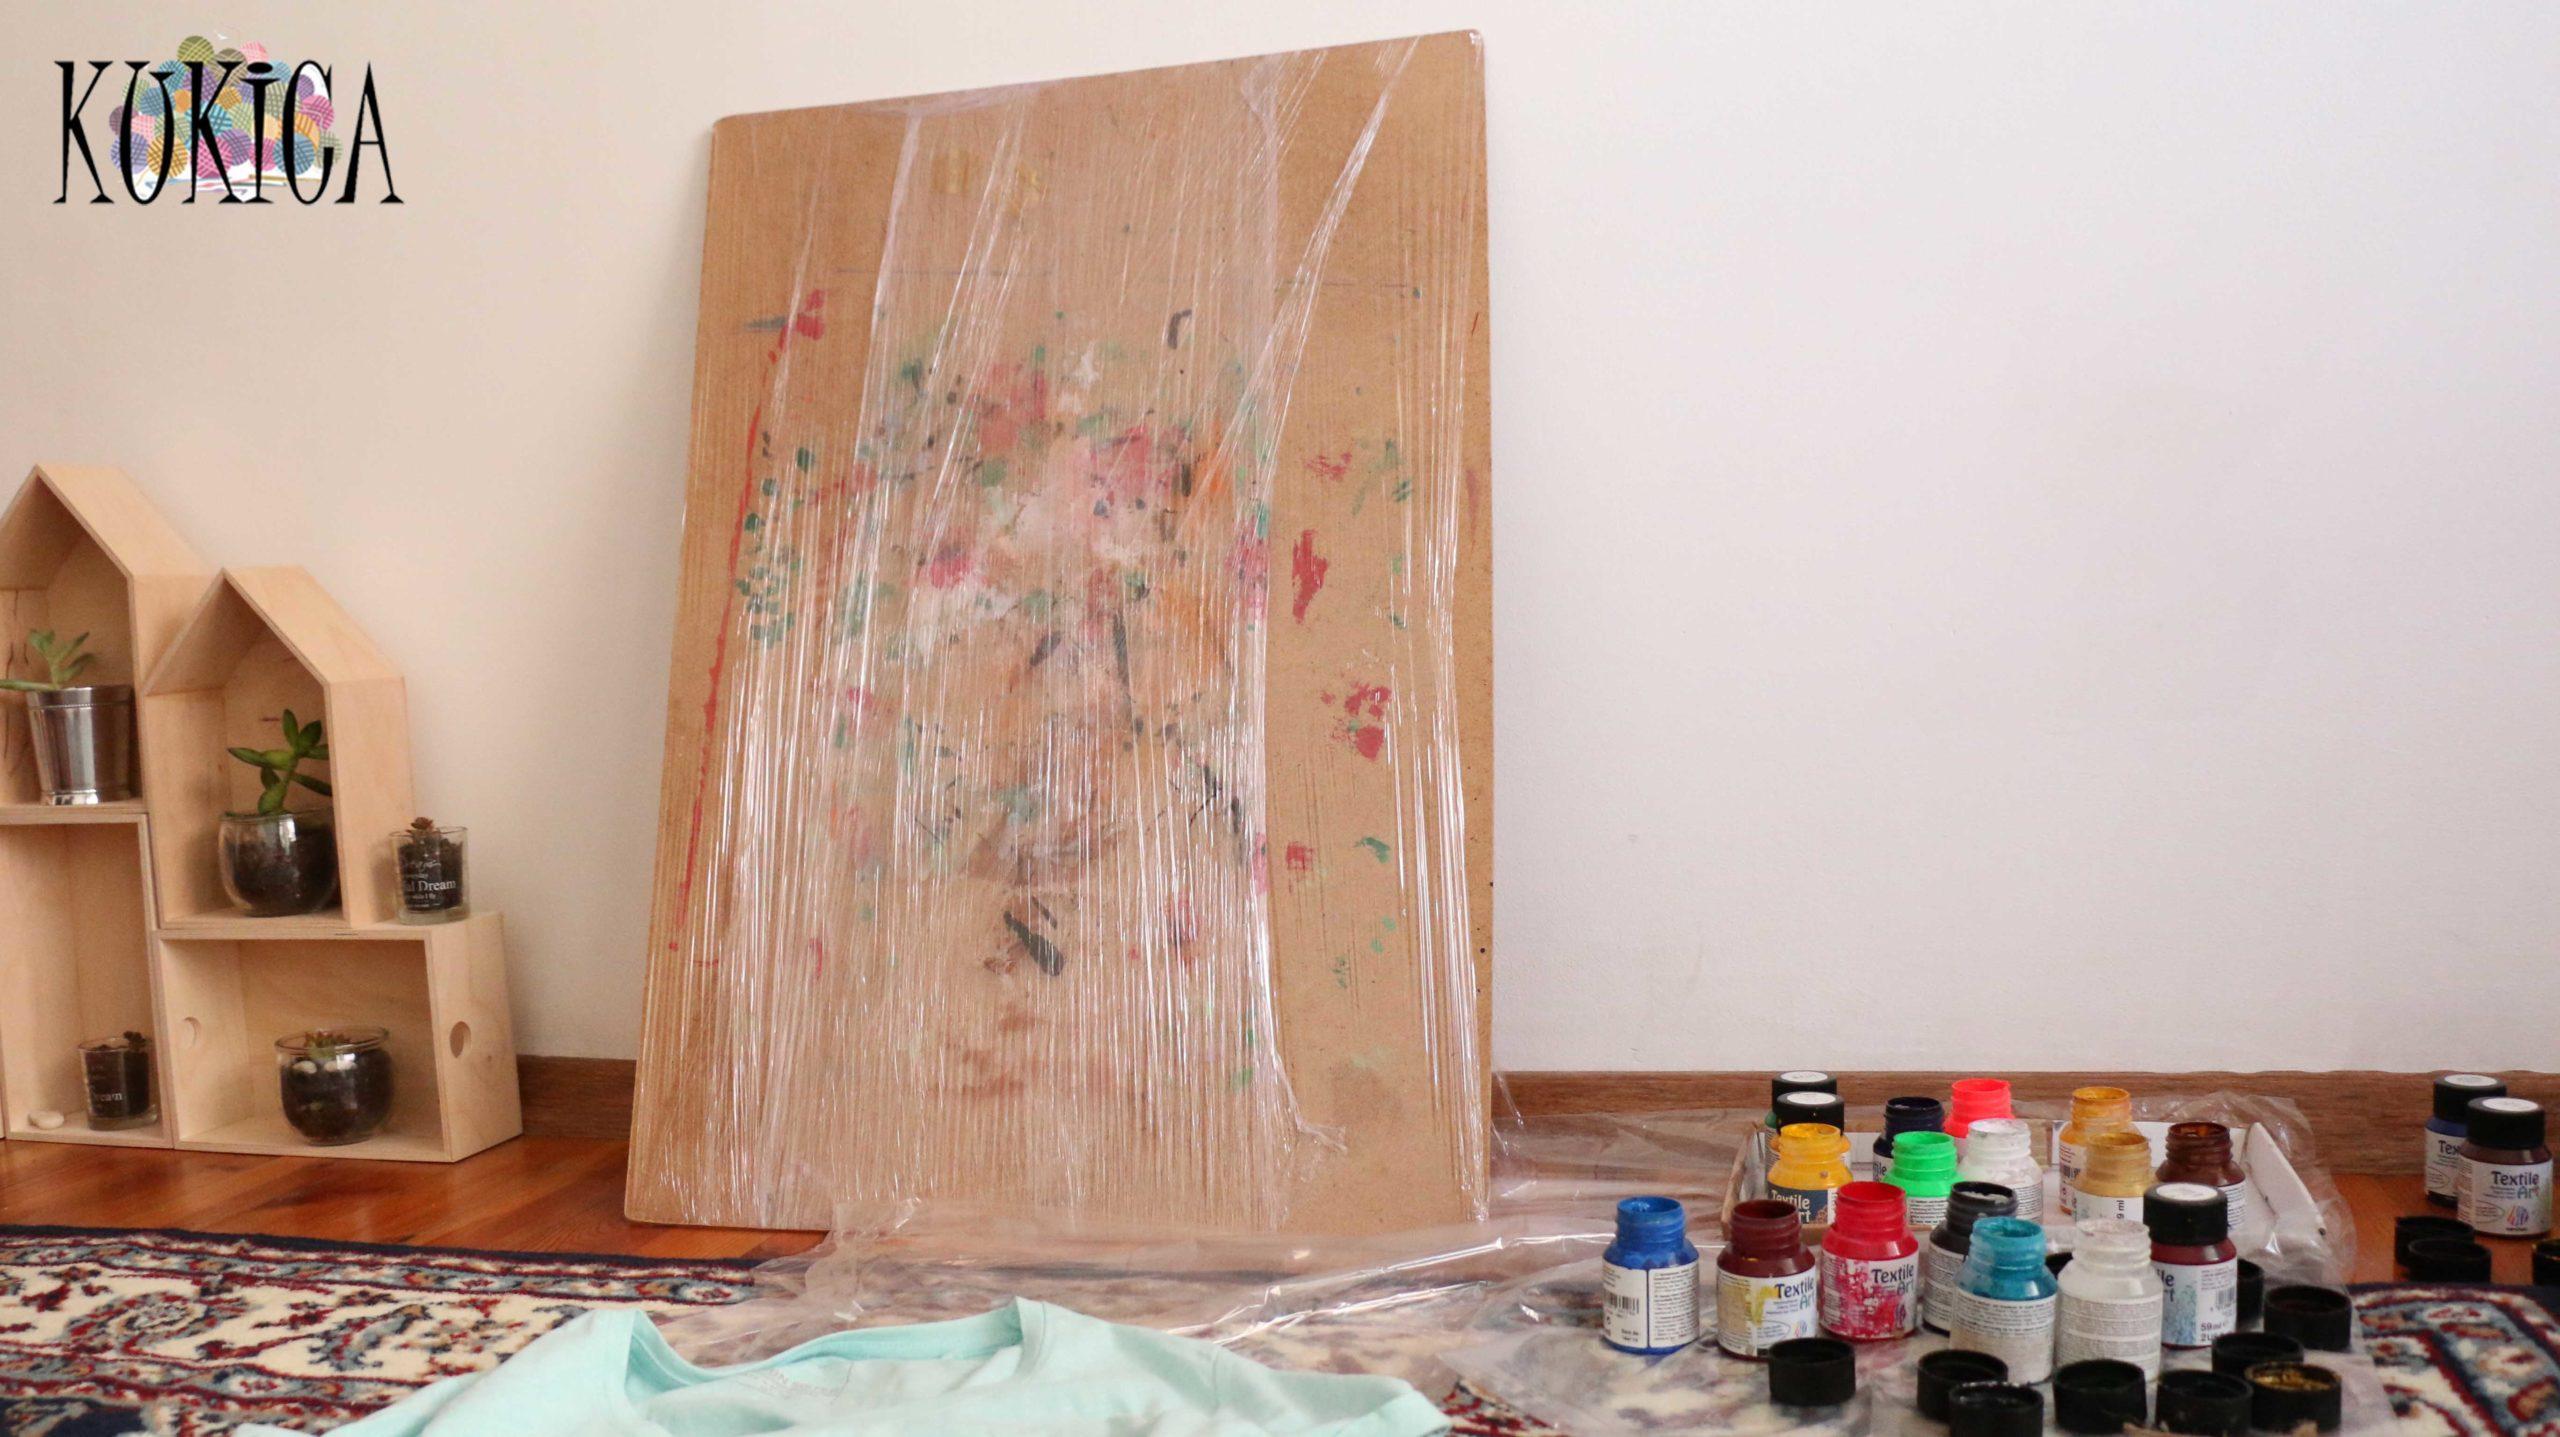 slikanje na tekstilu